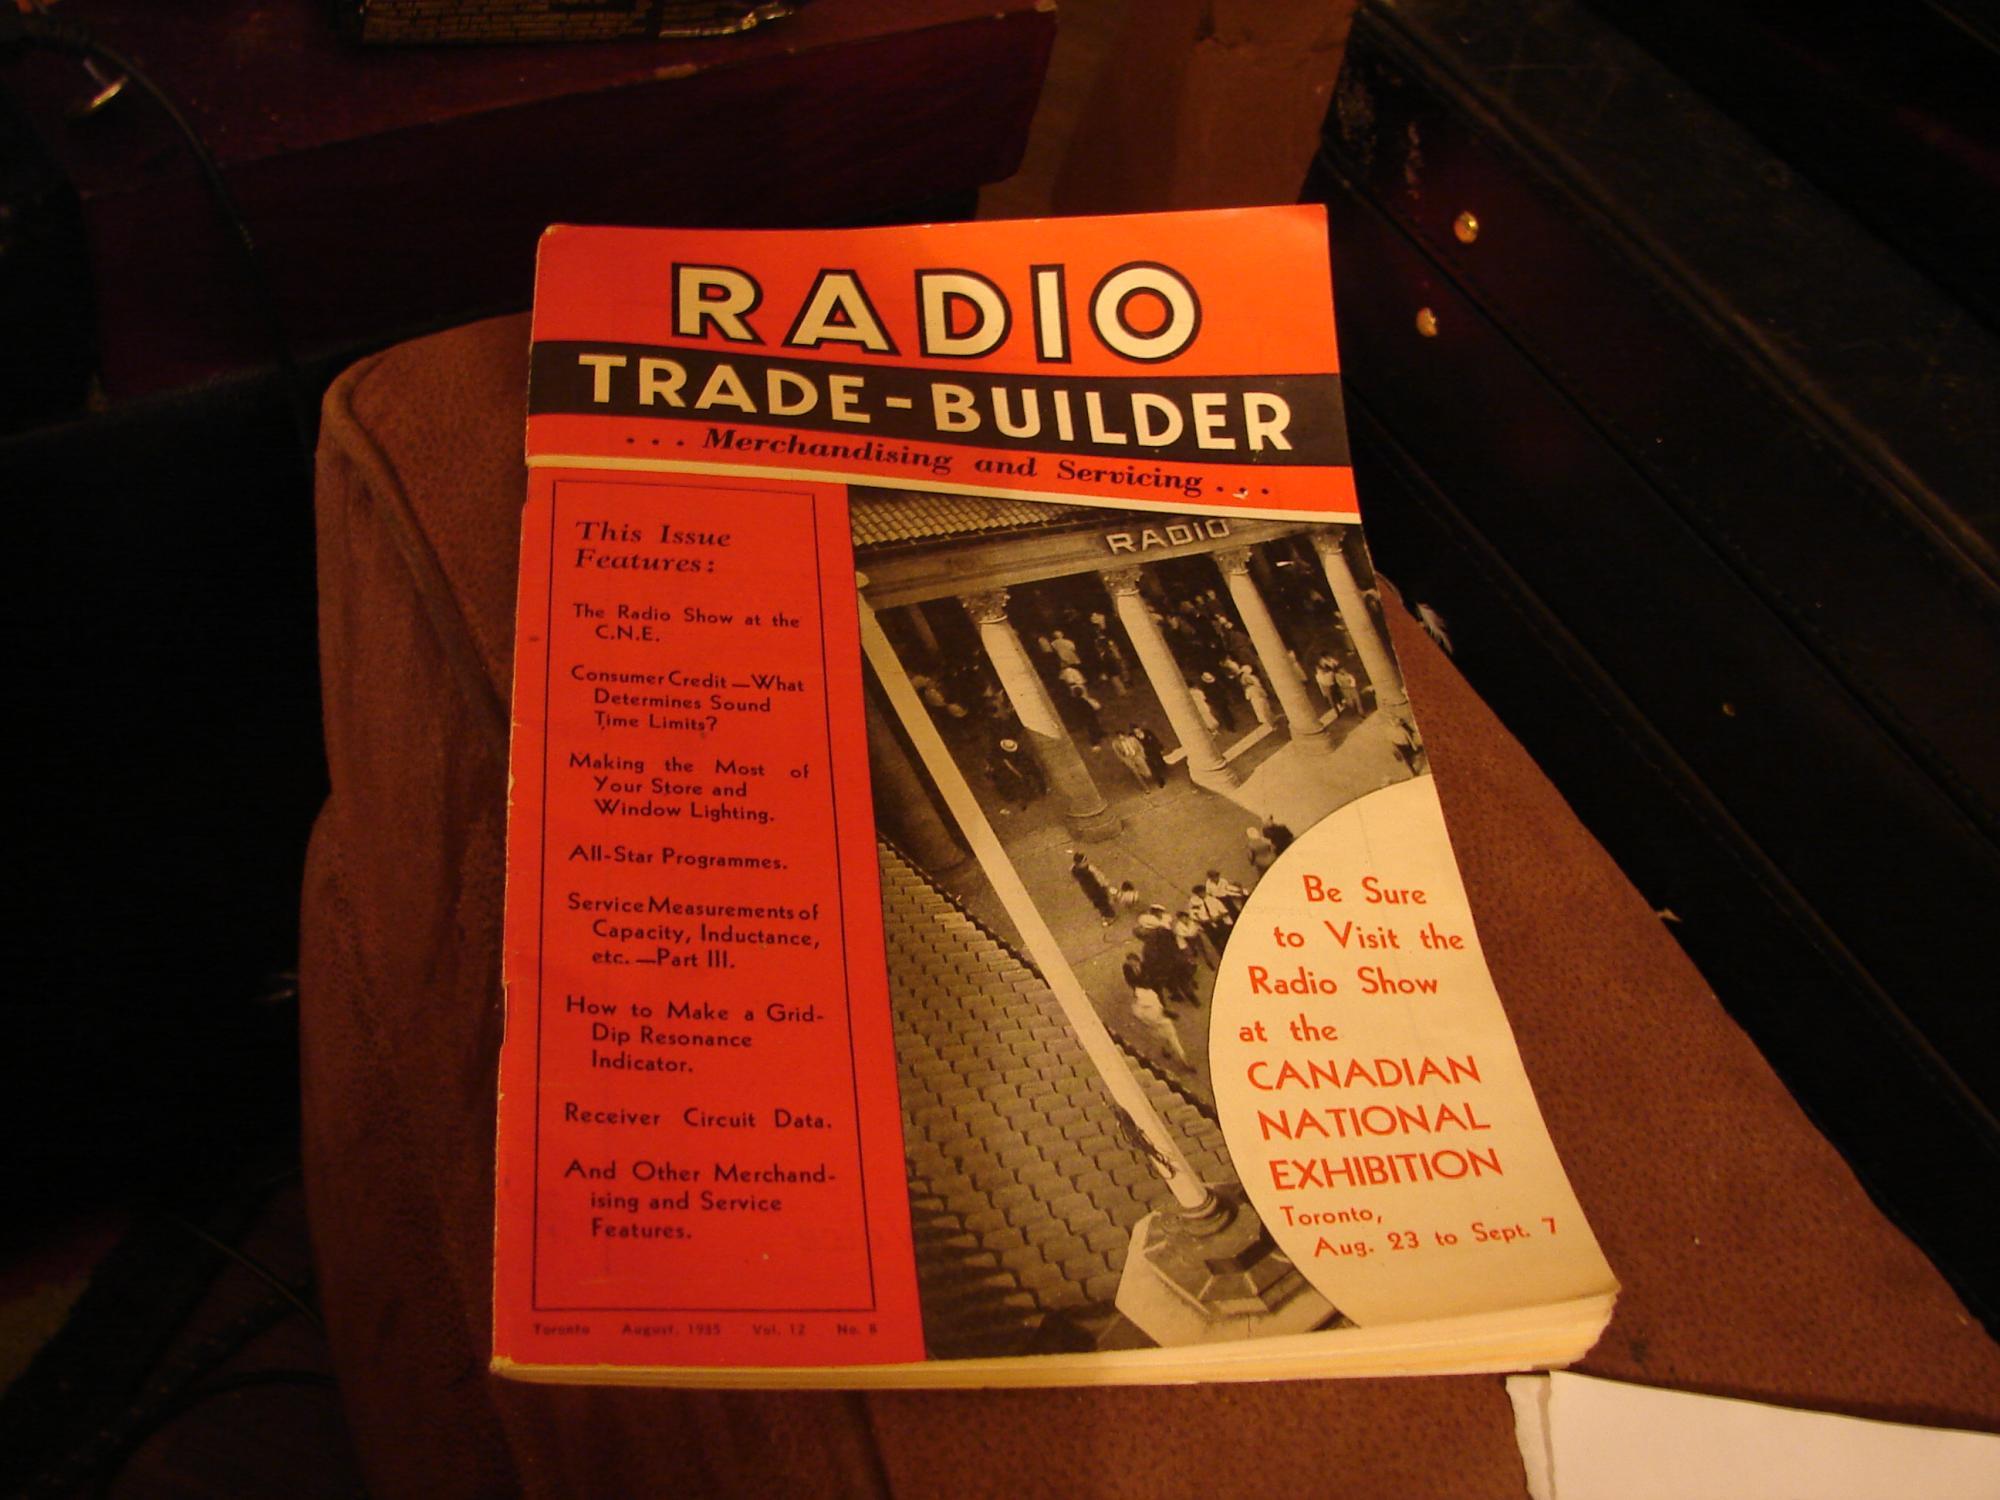 Radio Trade-Builder